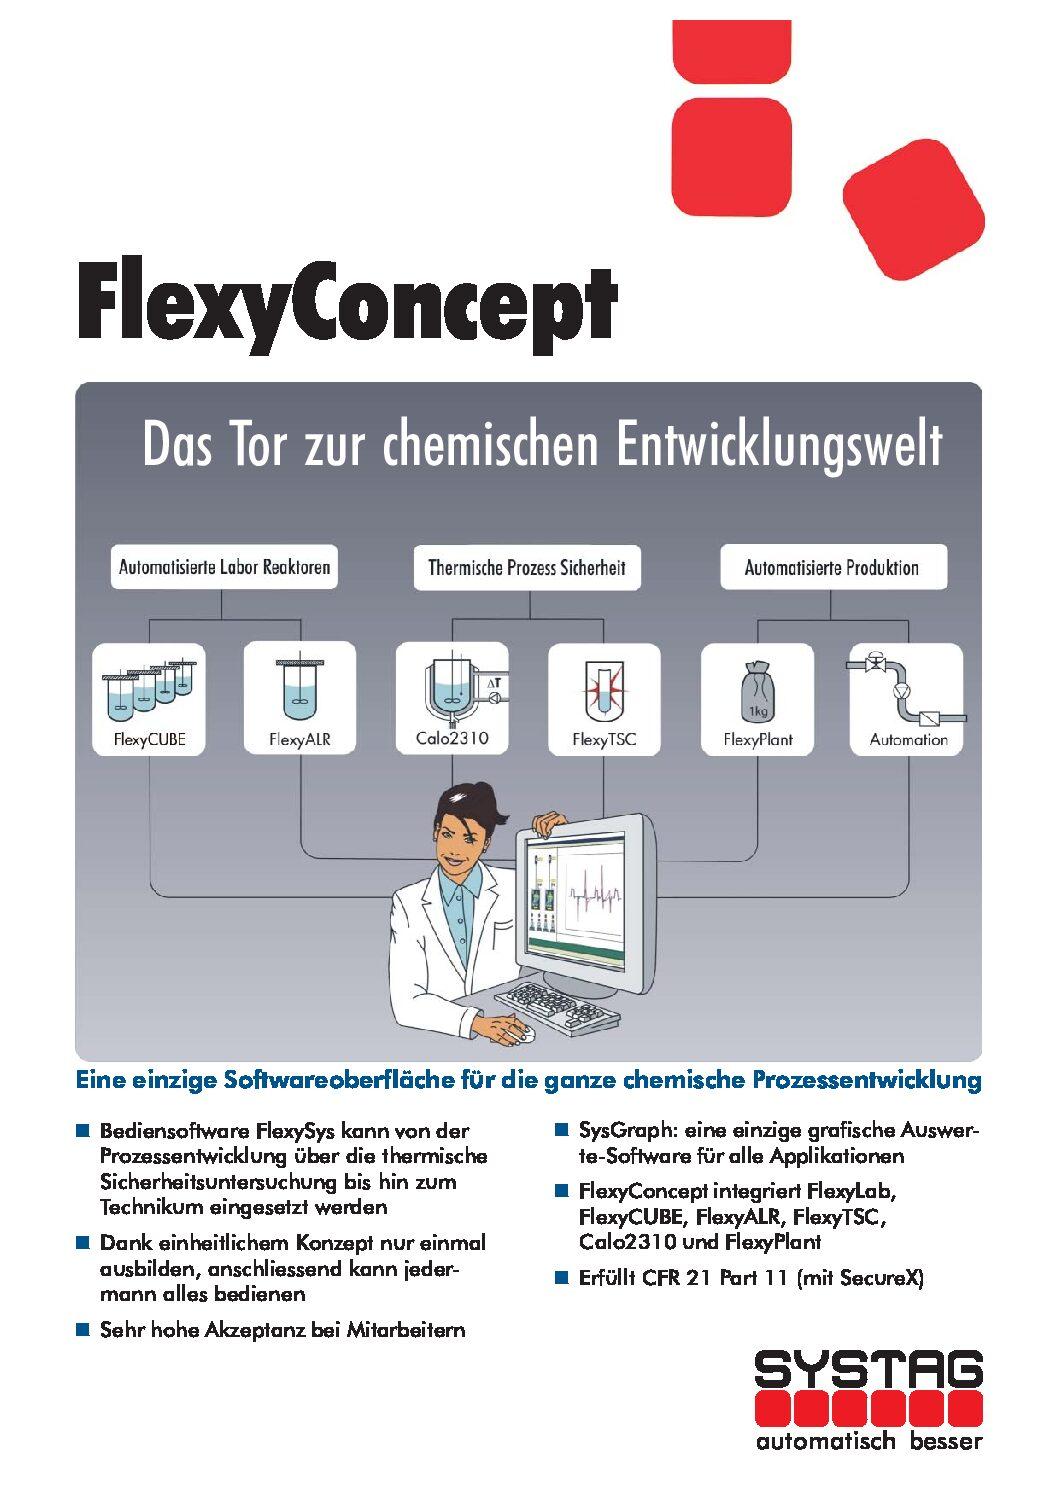 FlexyConcept